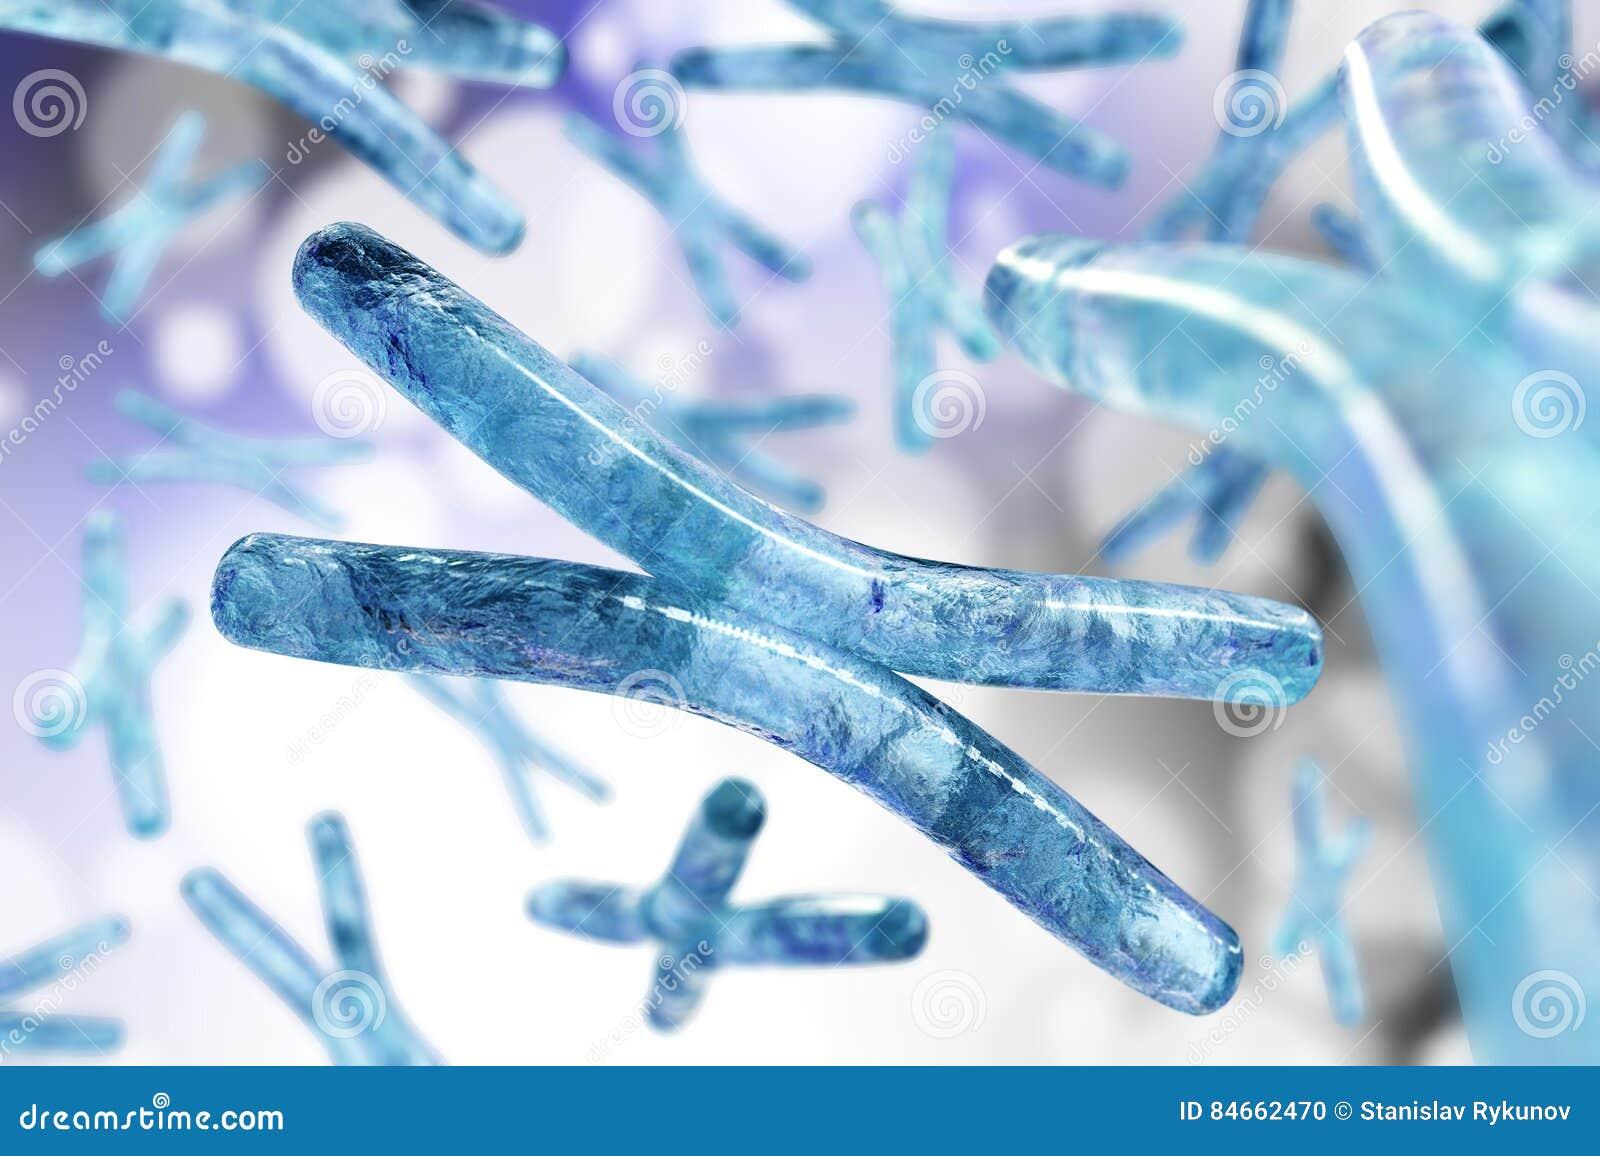 хромосома Дна